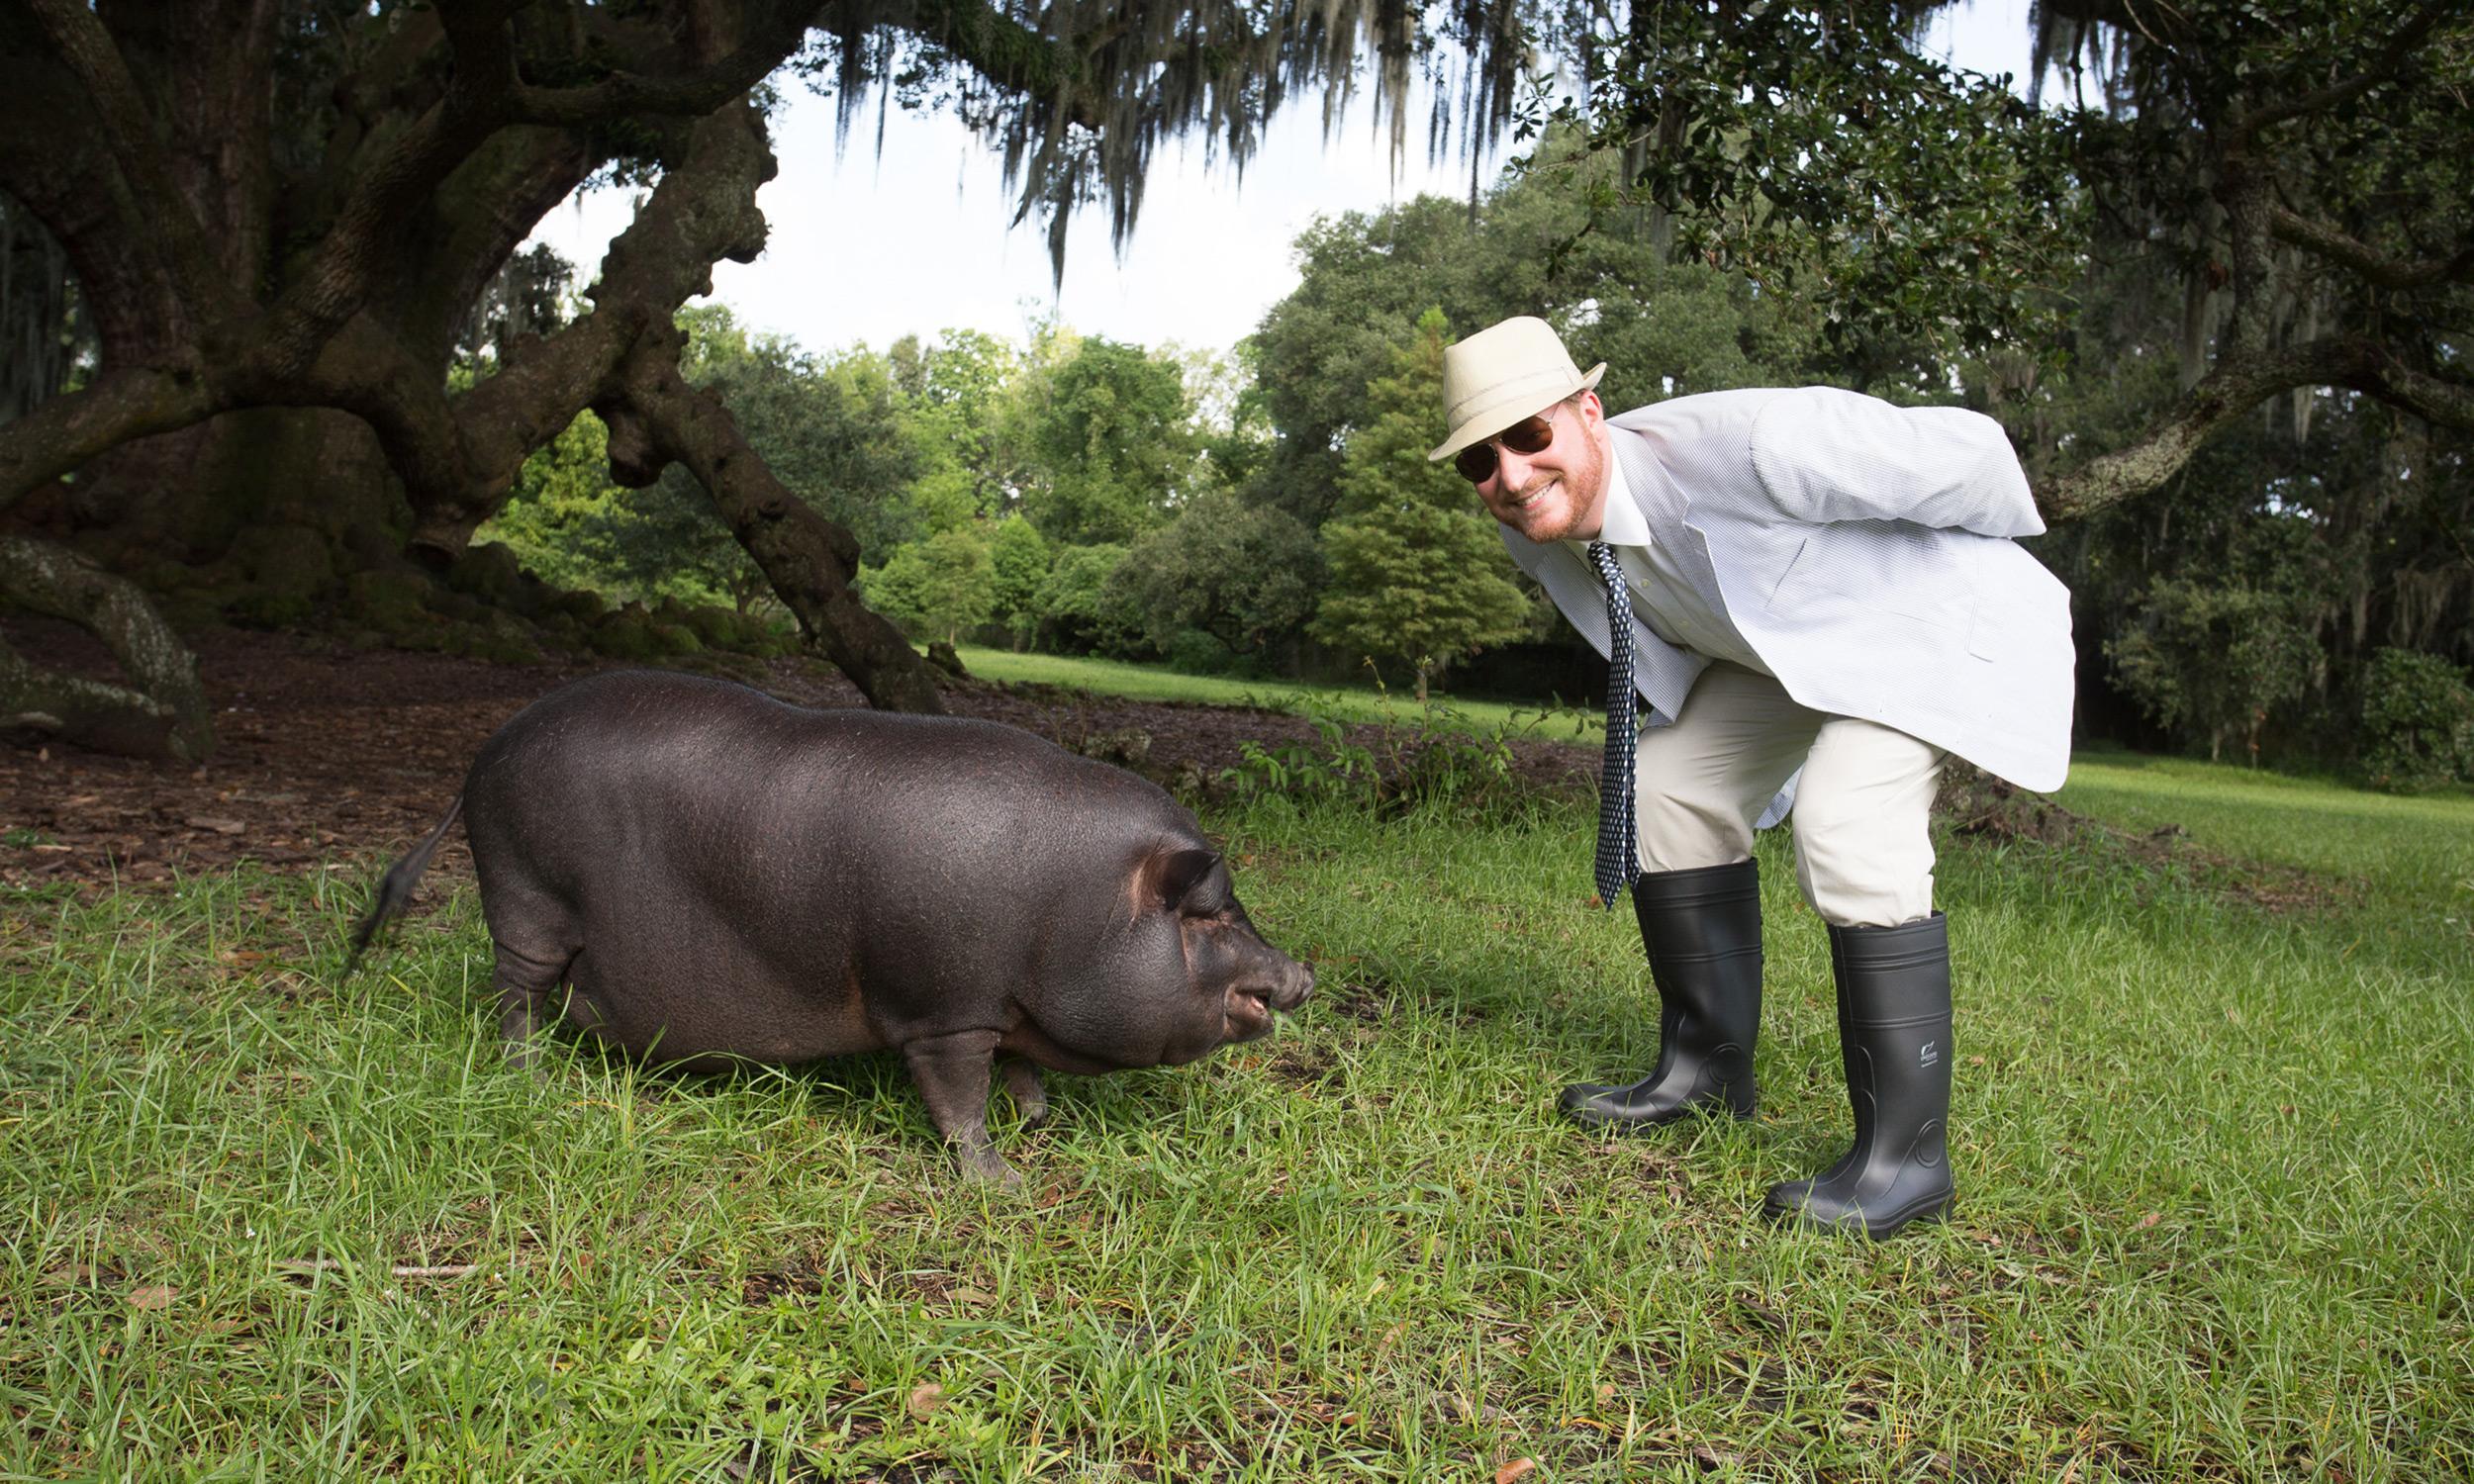 meet the extra crispy bacon critic extra crispy